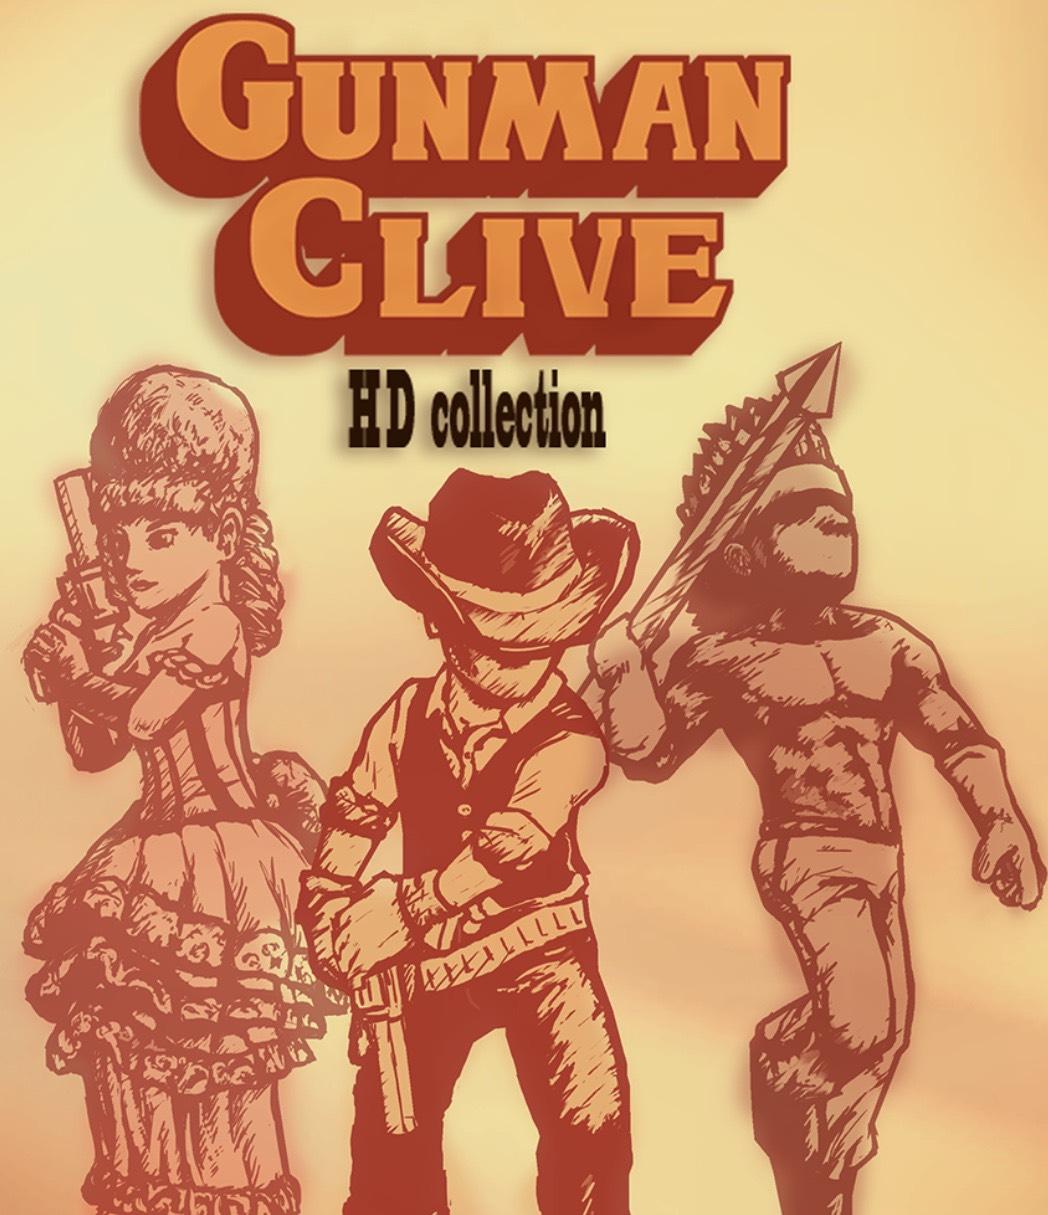 Gunman Clive HD Collection - £2.87 @ Nintendo Shop